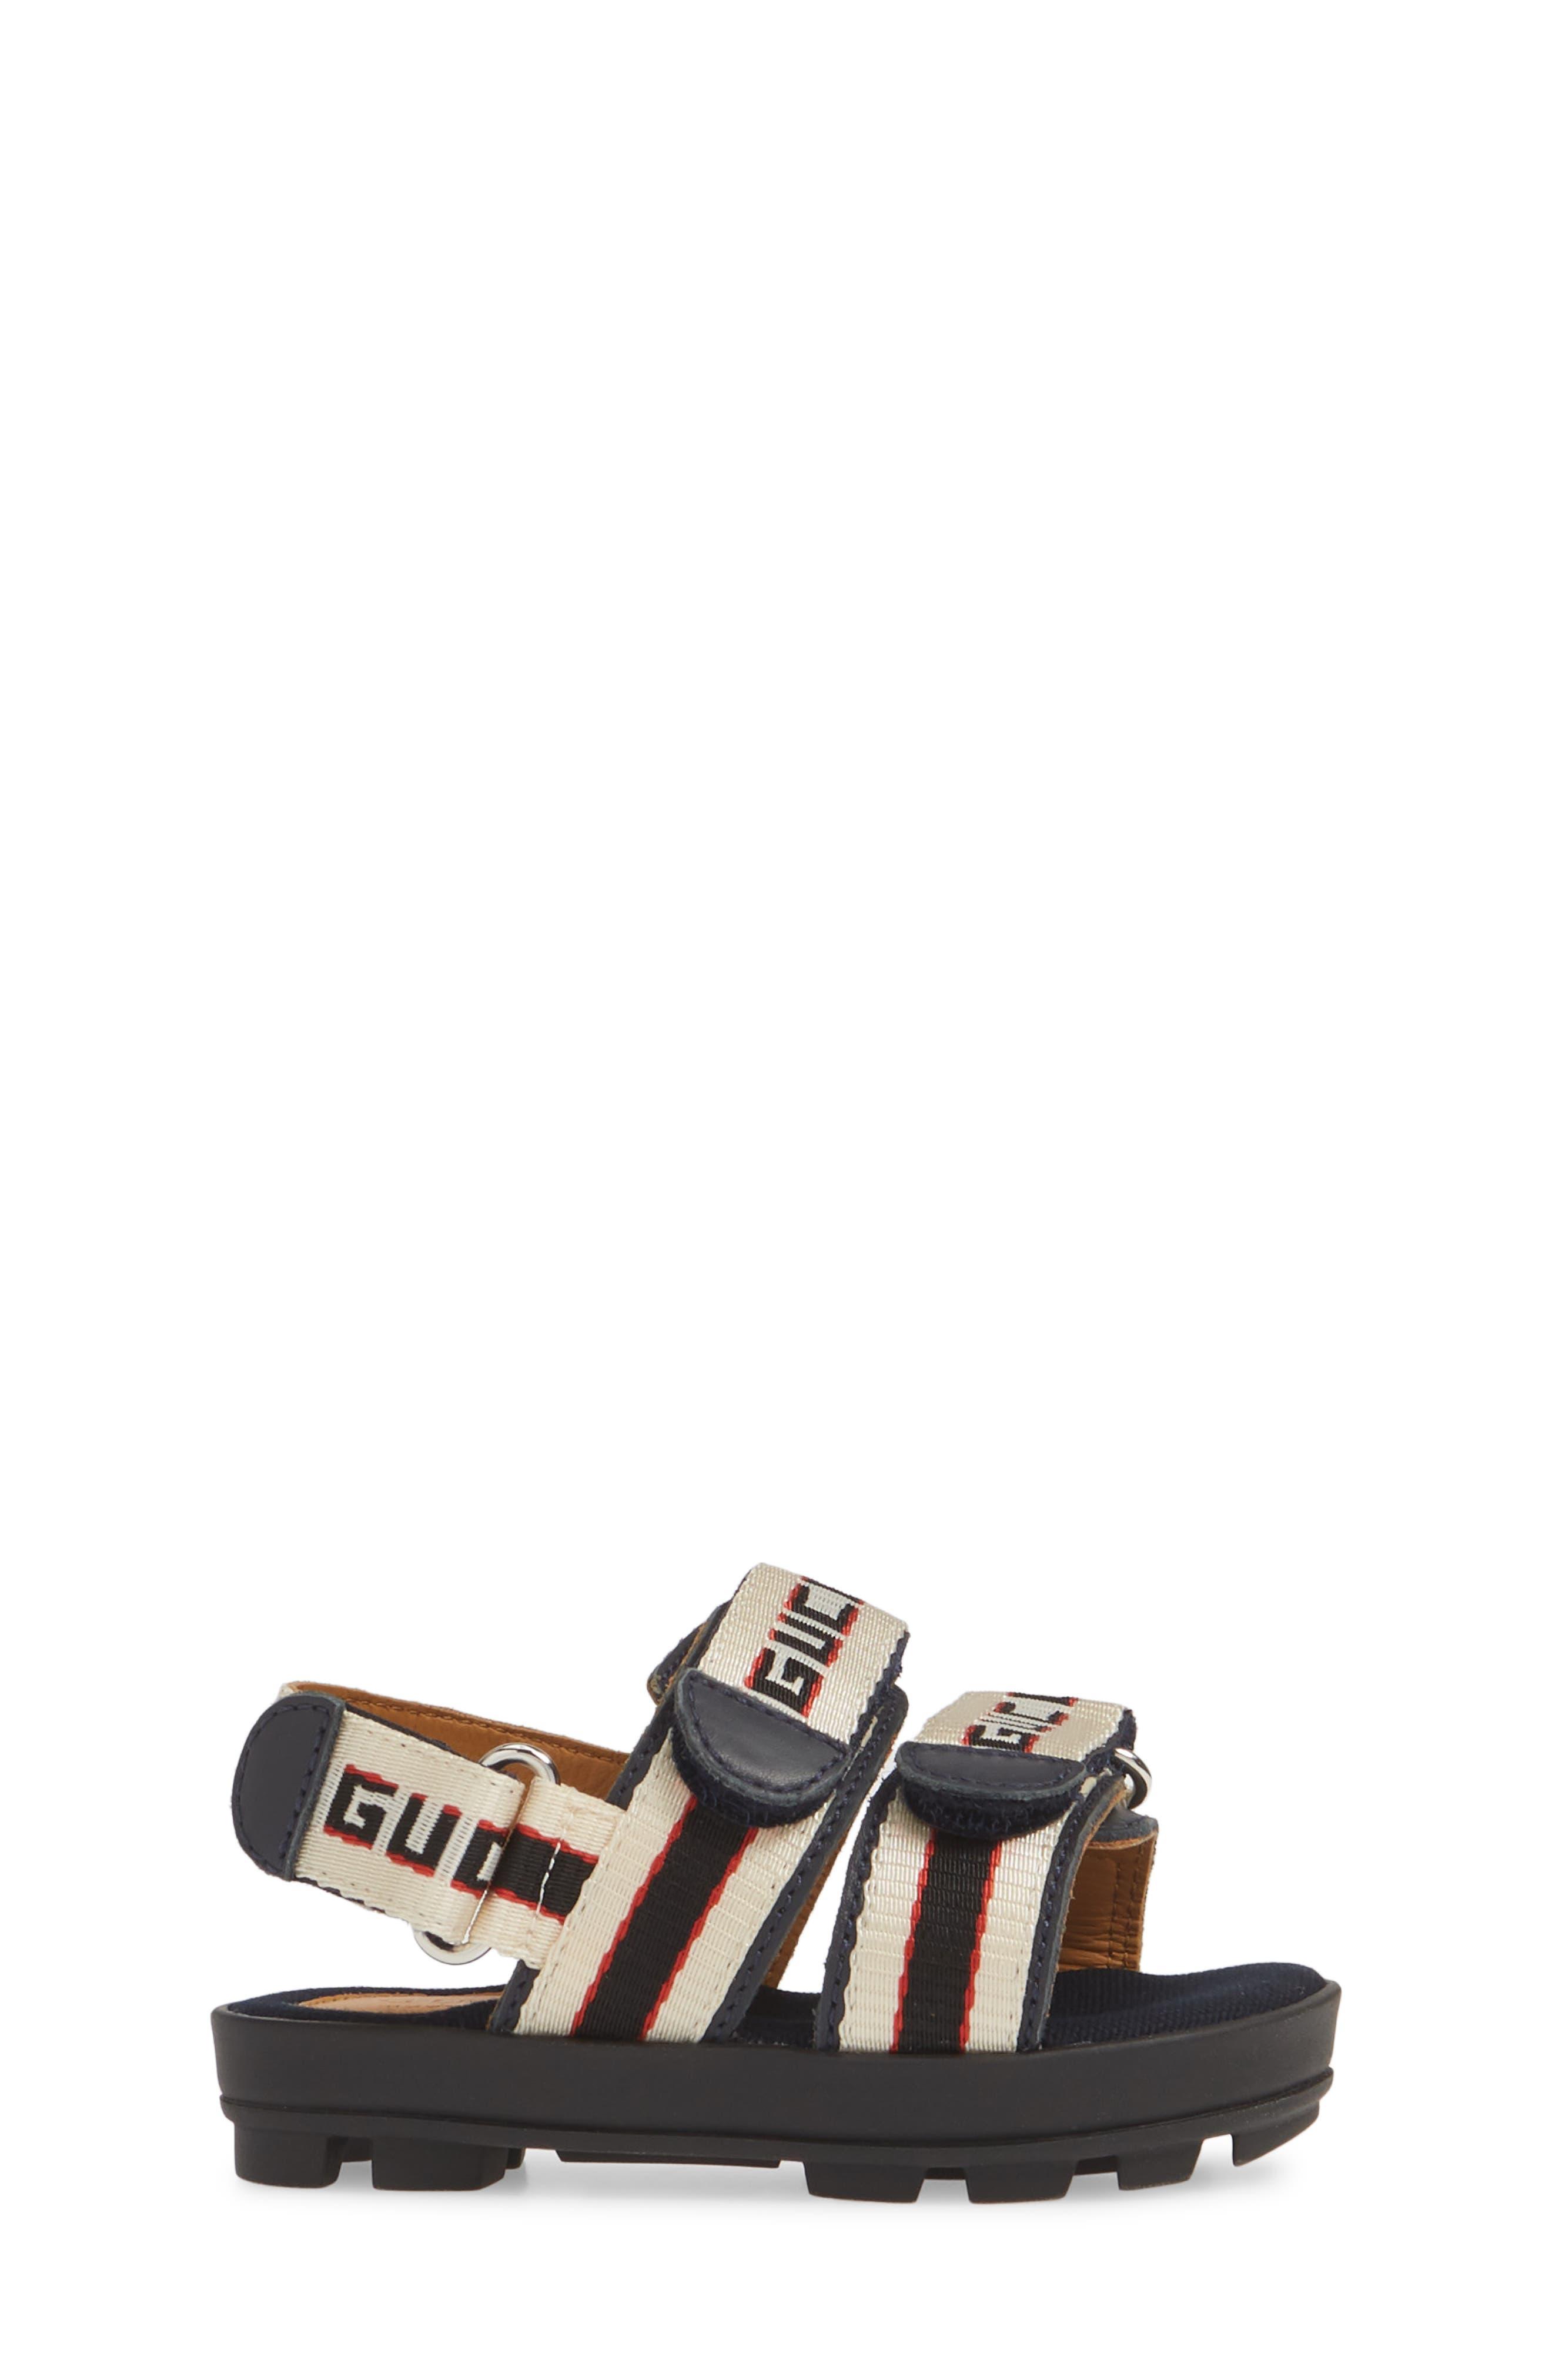 GUCCI, Sam Logo Strap Slingback Sandal, Alternate thumbnail 3, color, BLUE